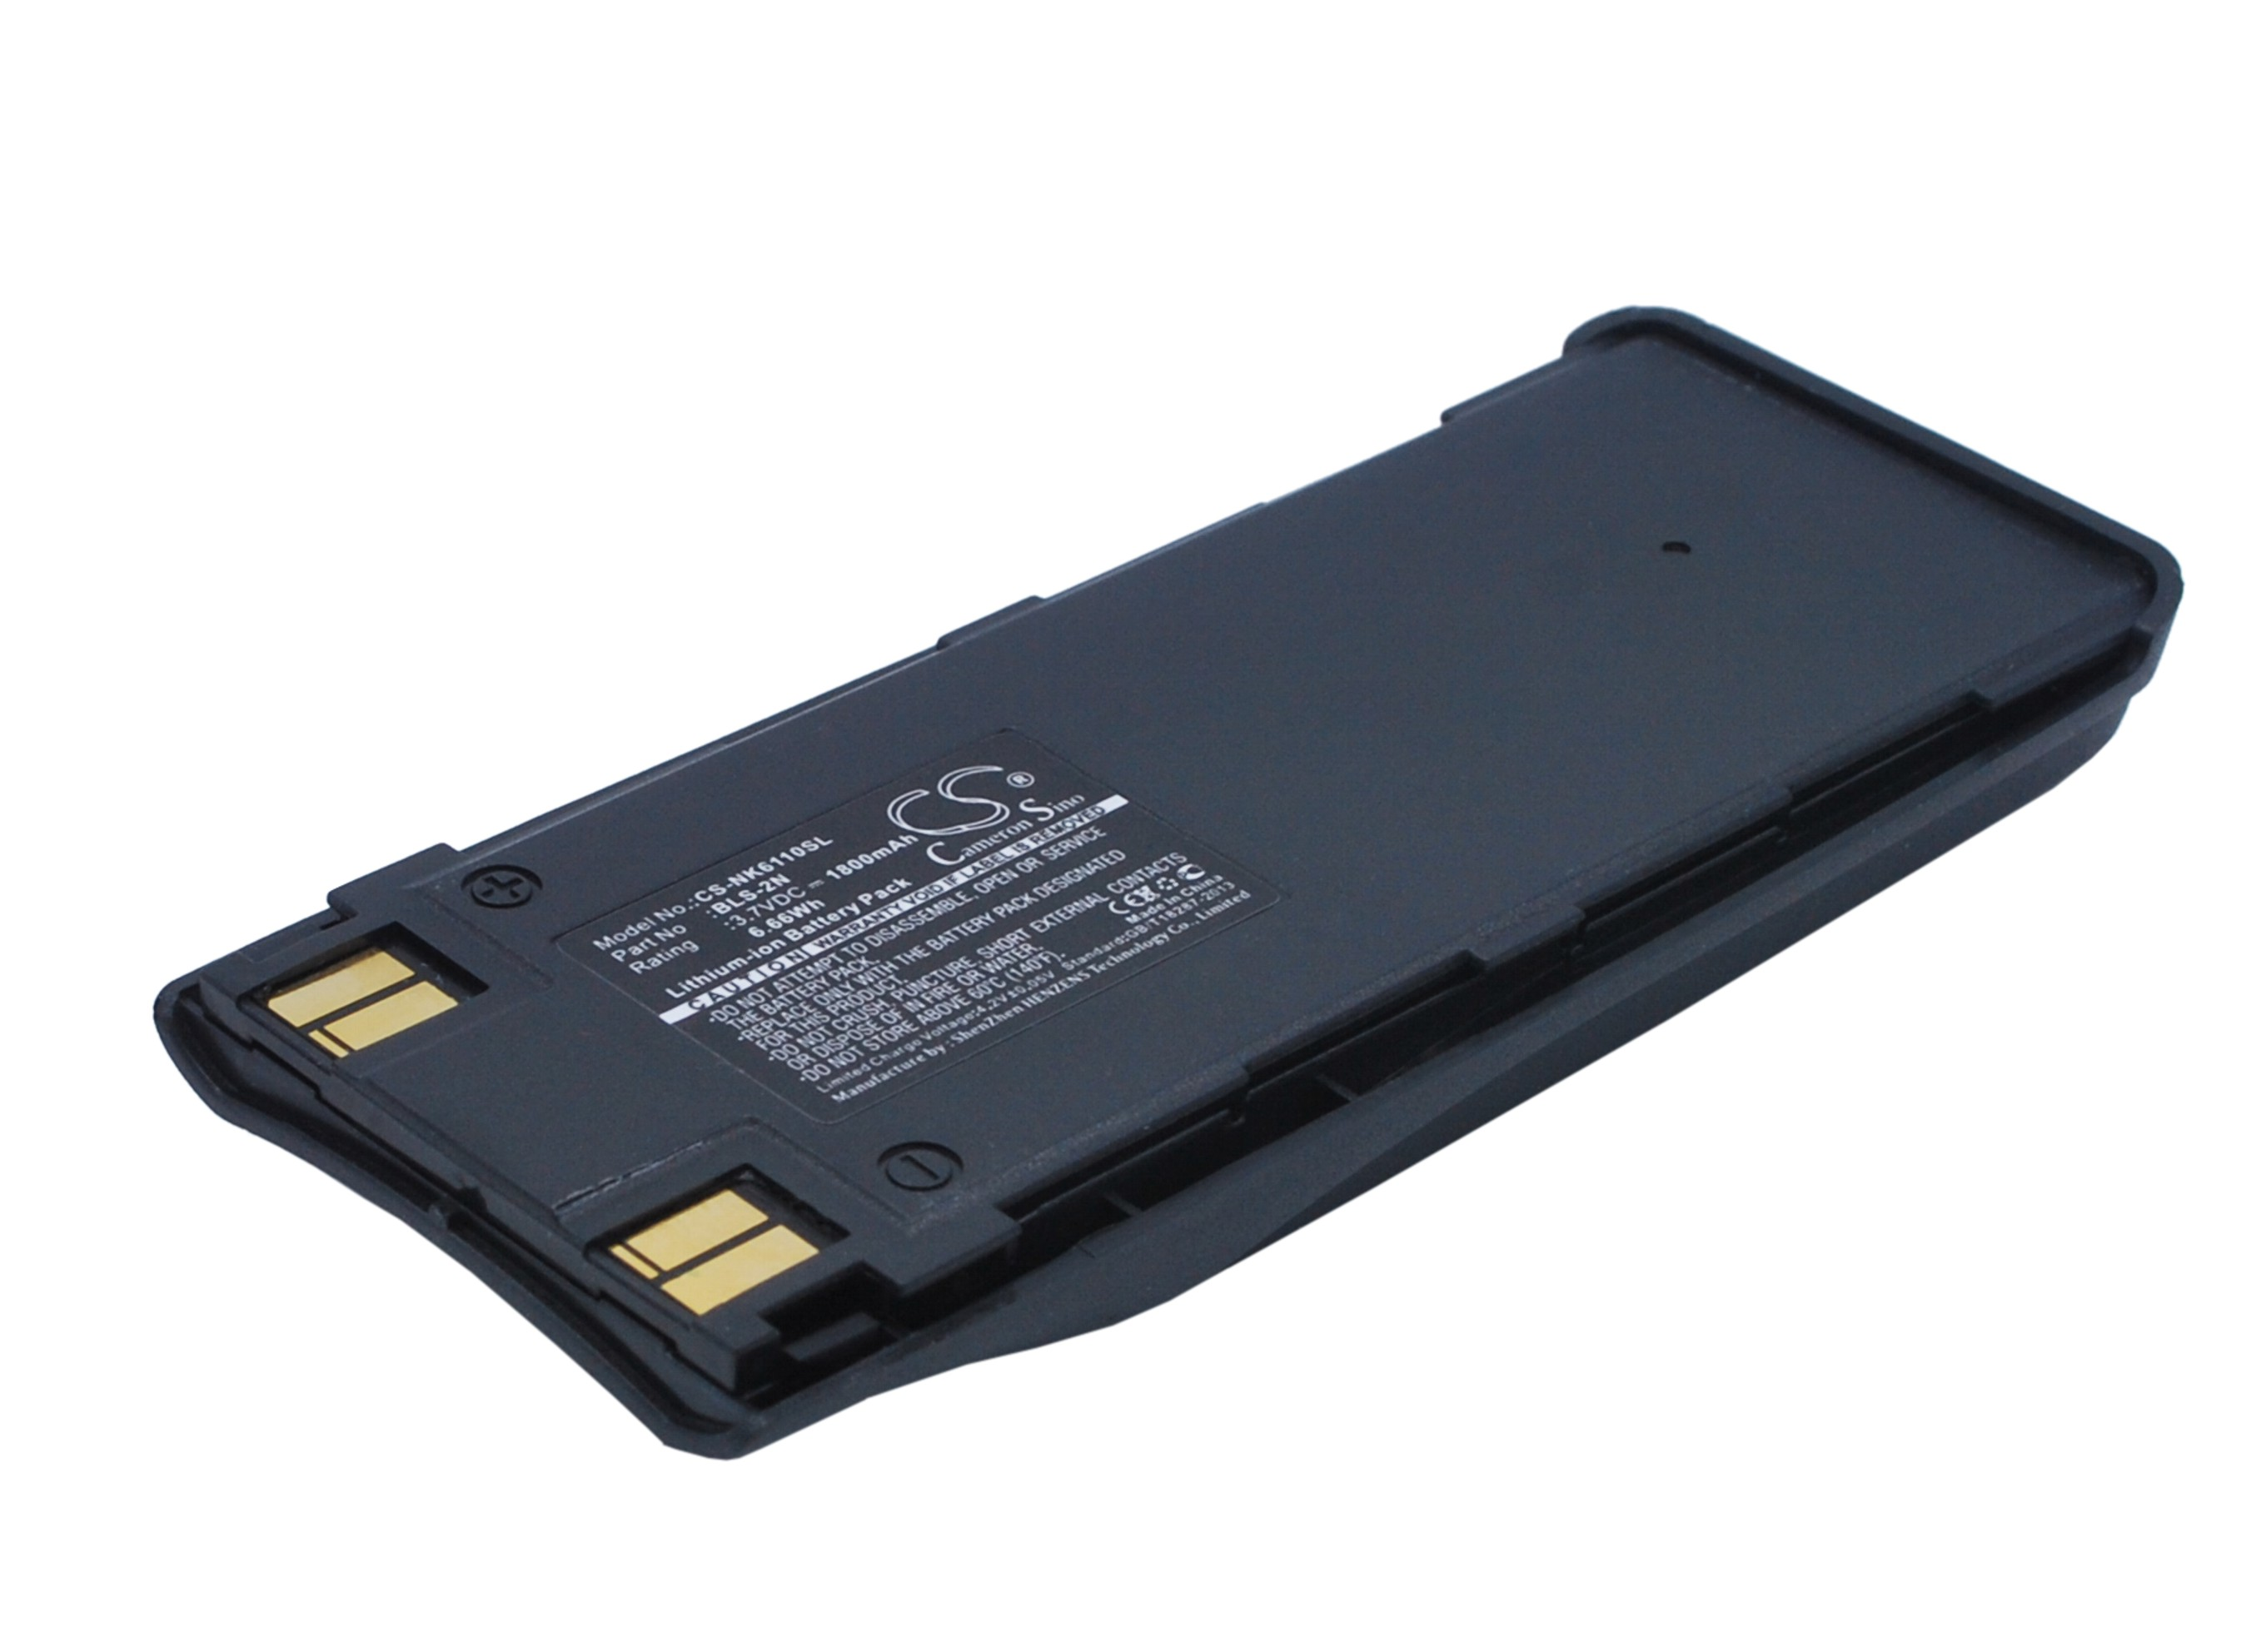 Cameron Sino baterie do mobilů pro NOKIA 6310i 3.7V Li-ion 1800mAh černá - neoriginální